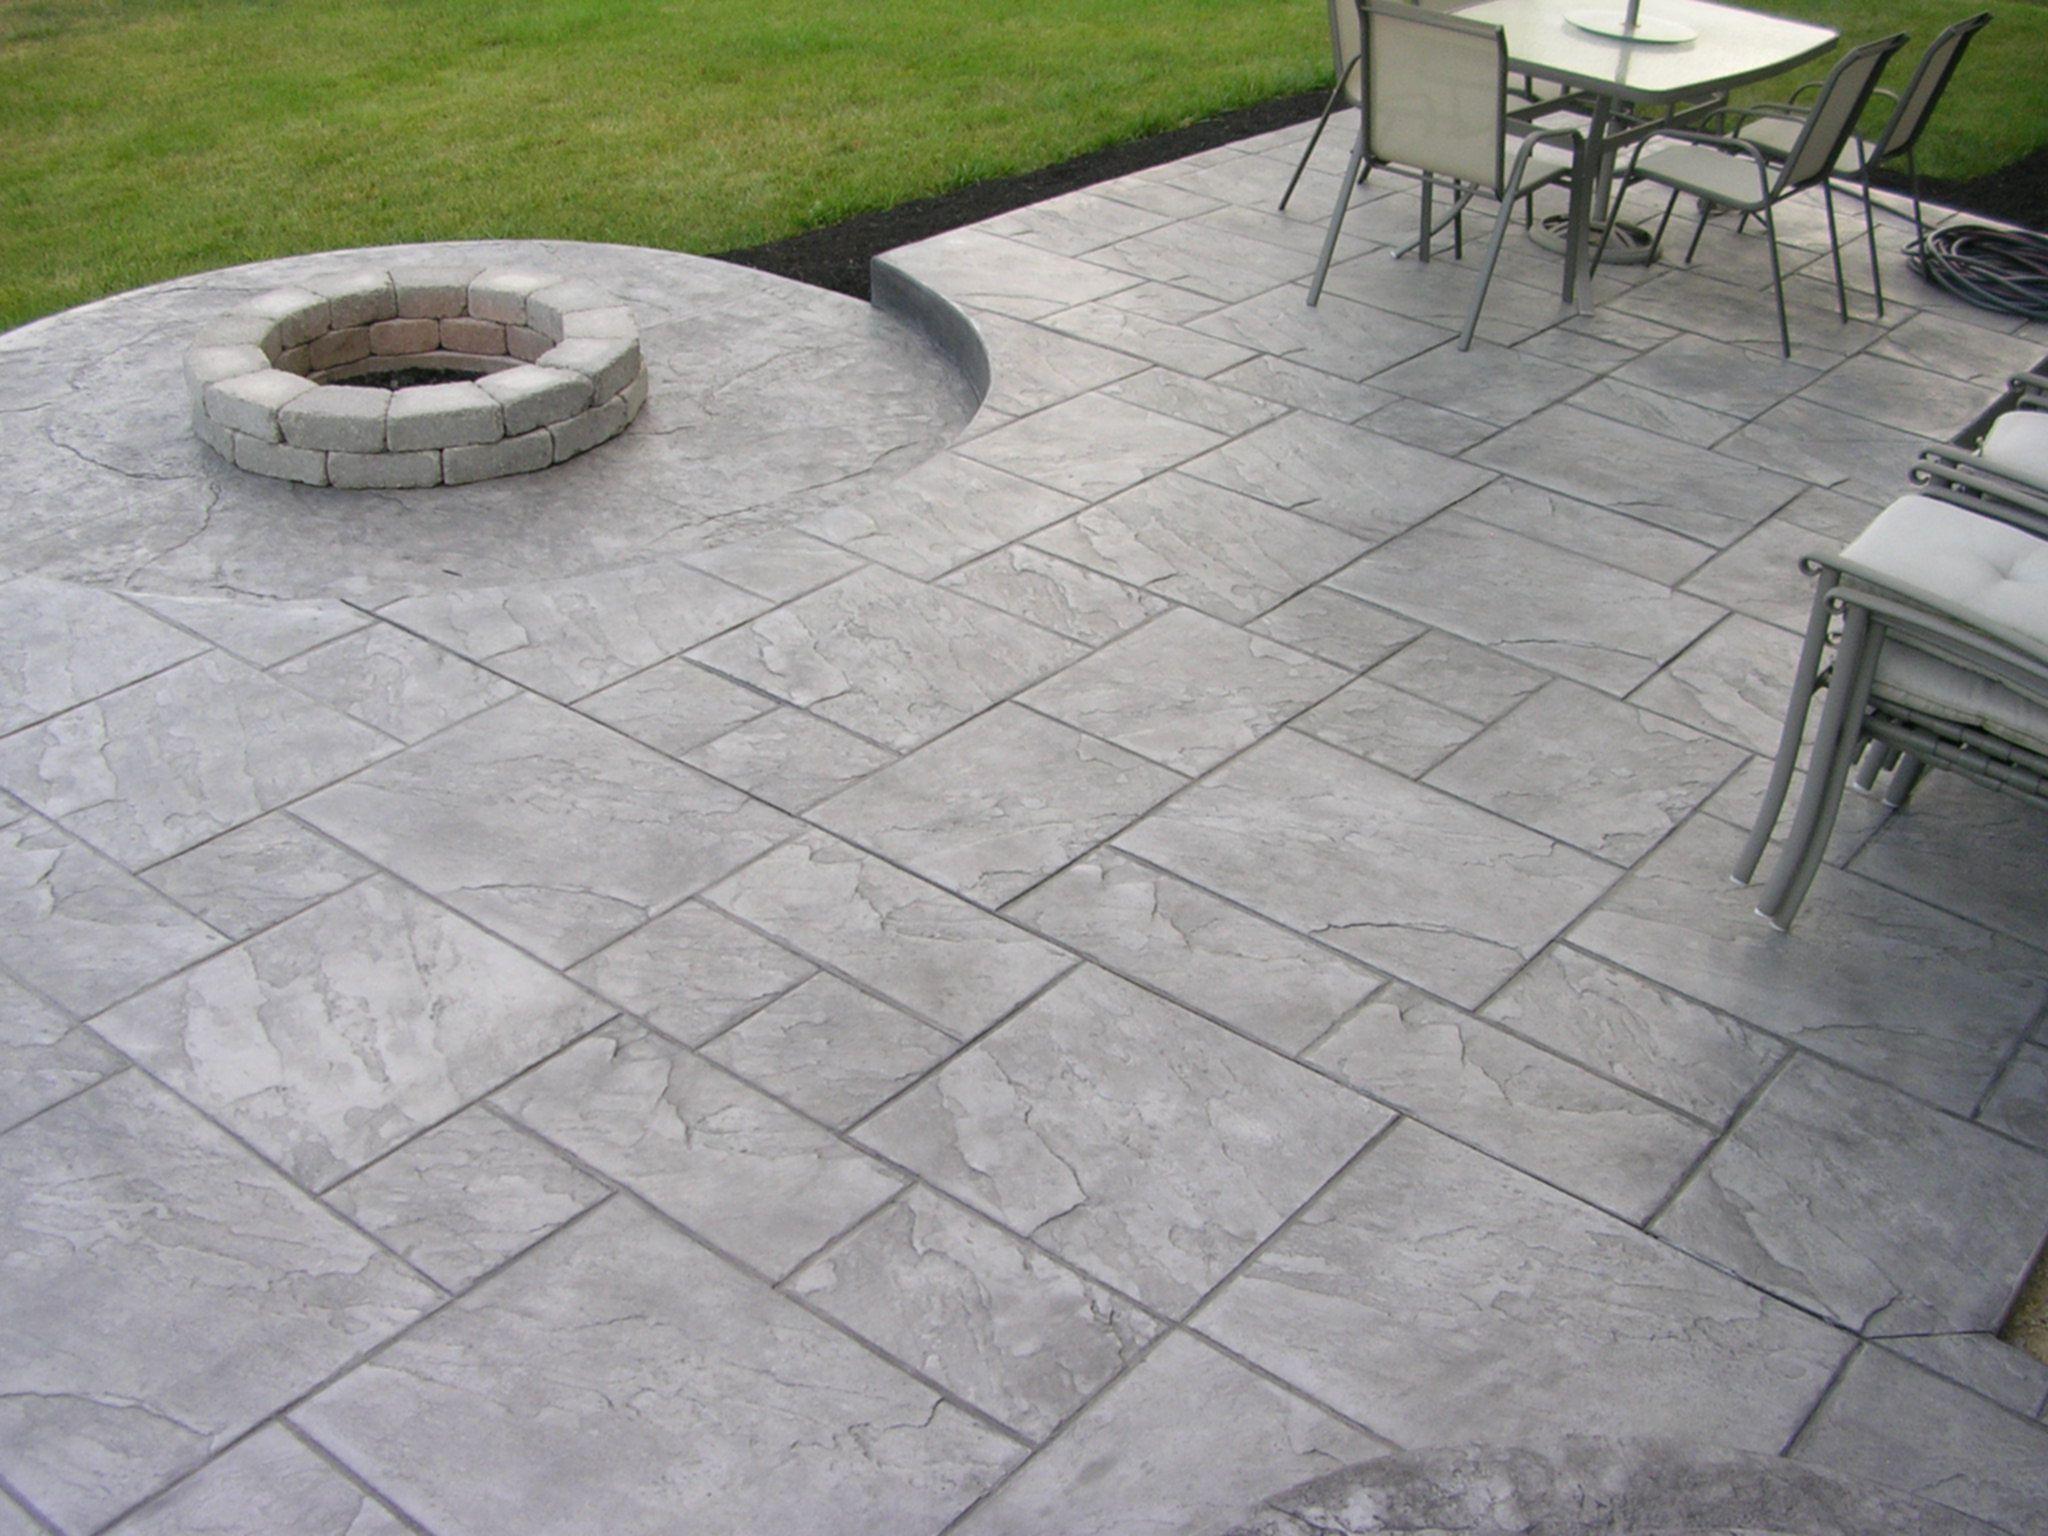 Nice 10 Best Stamped Concrete Walkways Ideas For Your Home Https Decoor Net Astonishing 45 B Concrete Backyard Concrete Patio Designs Stamped Concrete Patio